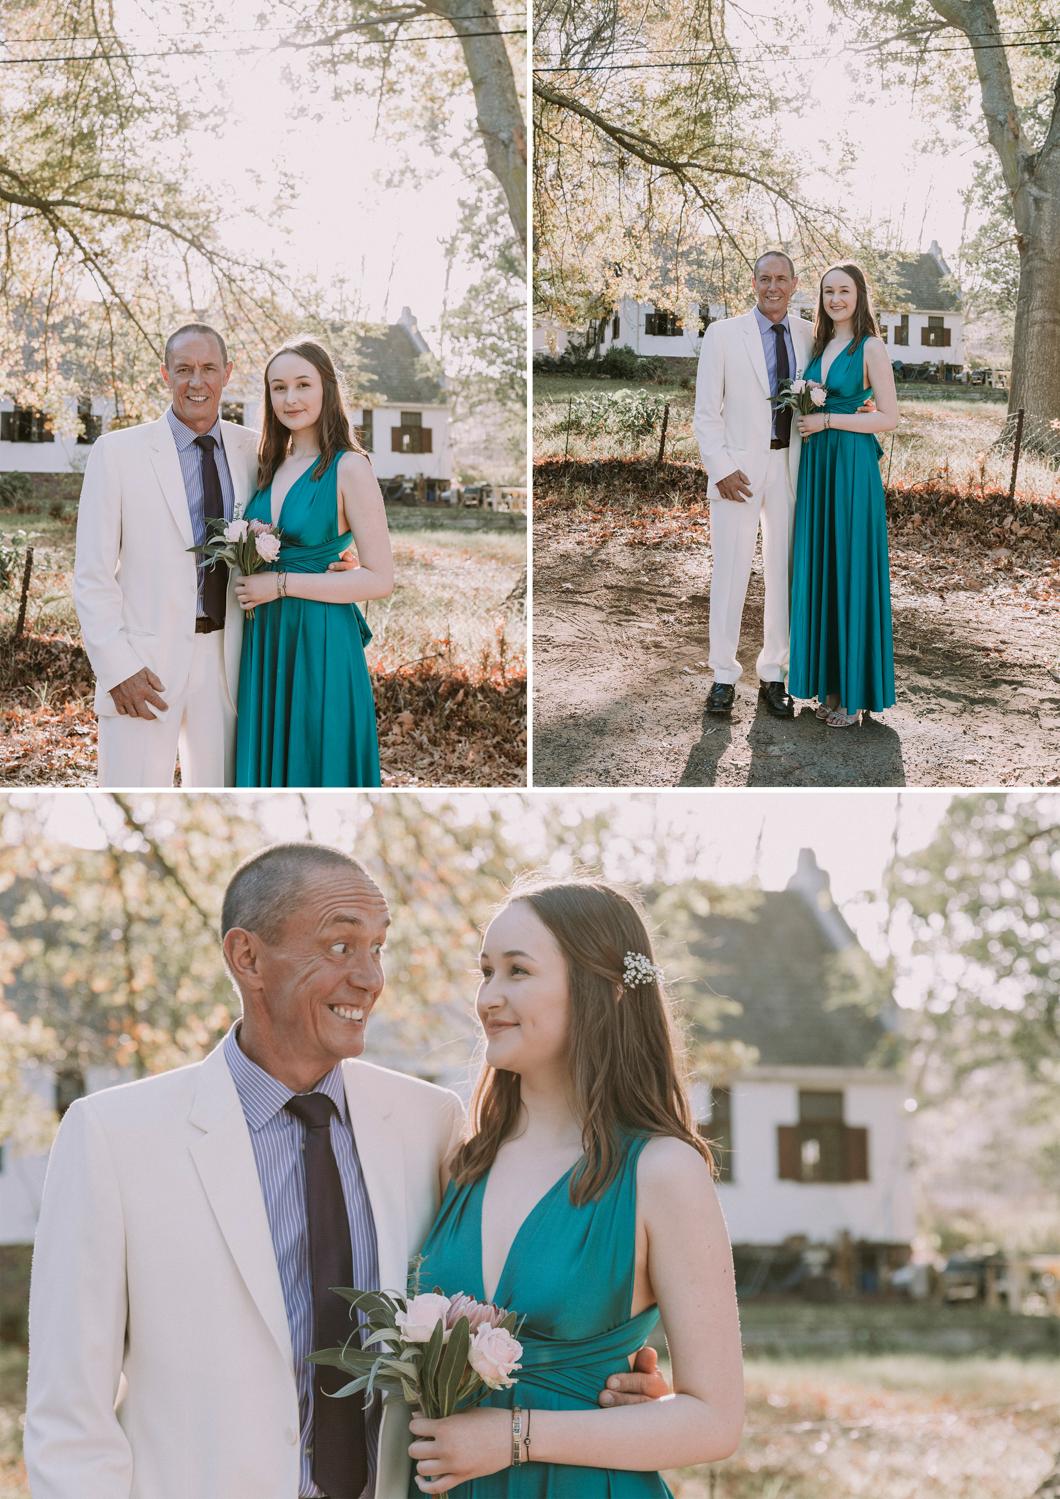 cape town wedding photographer - bianca asher-15.jpg